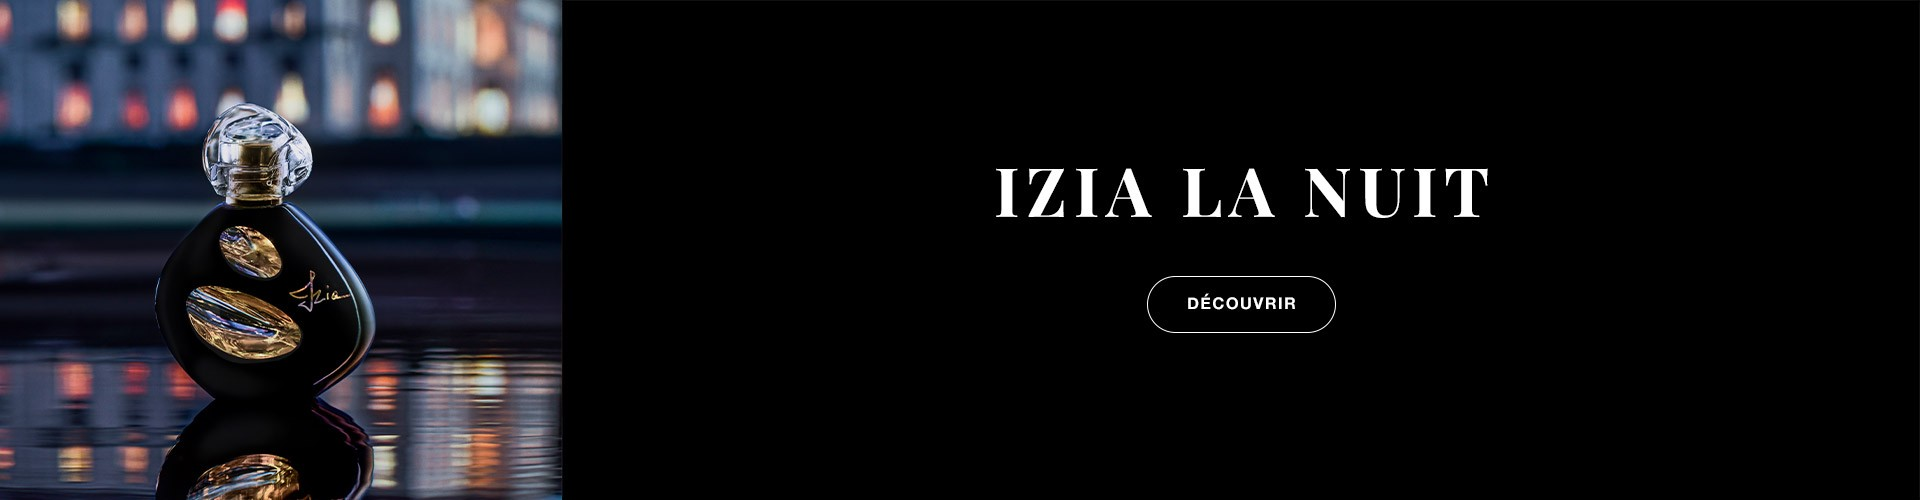 Izia La Nuit